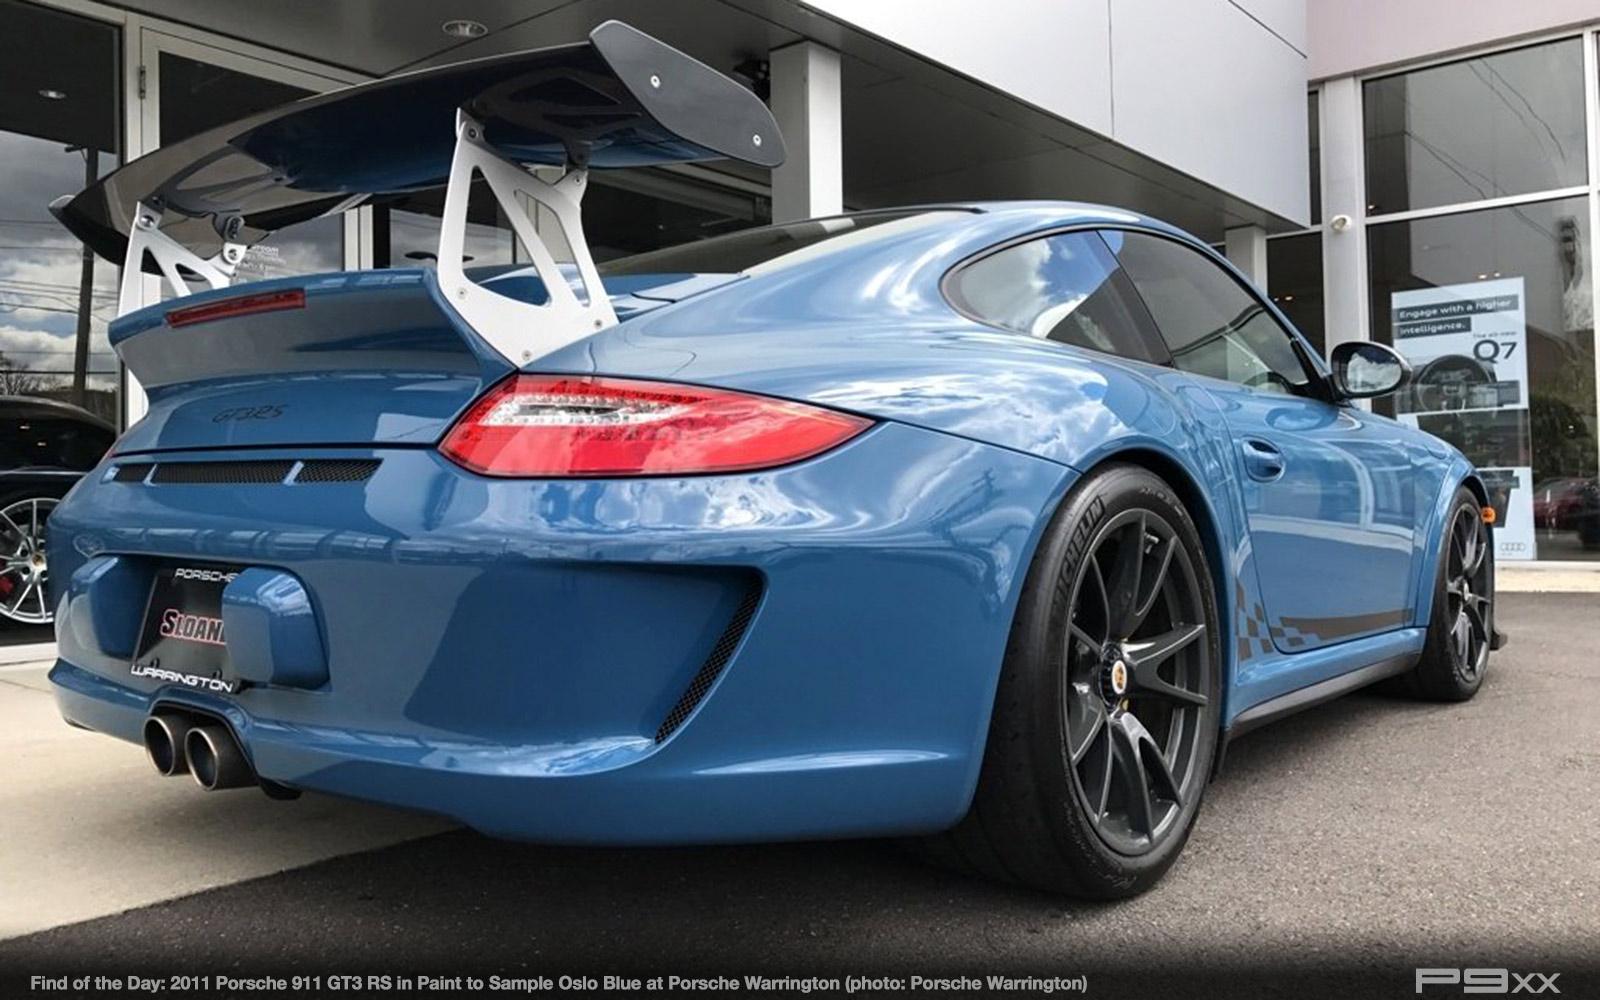 In Market Paint To Sample Oslo Blue 2011 Porsche 911 Gt3